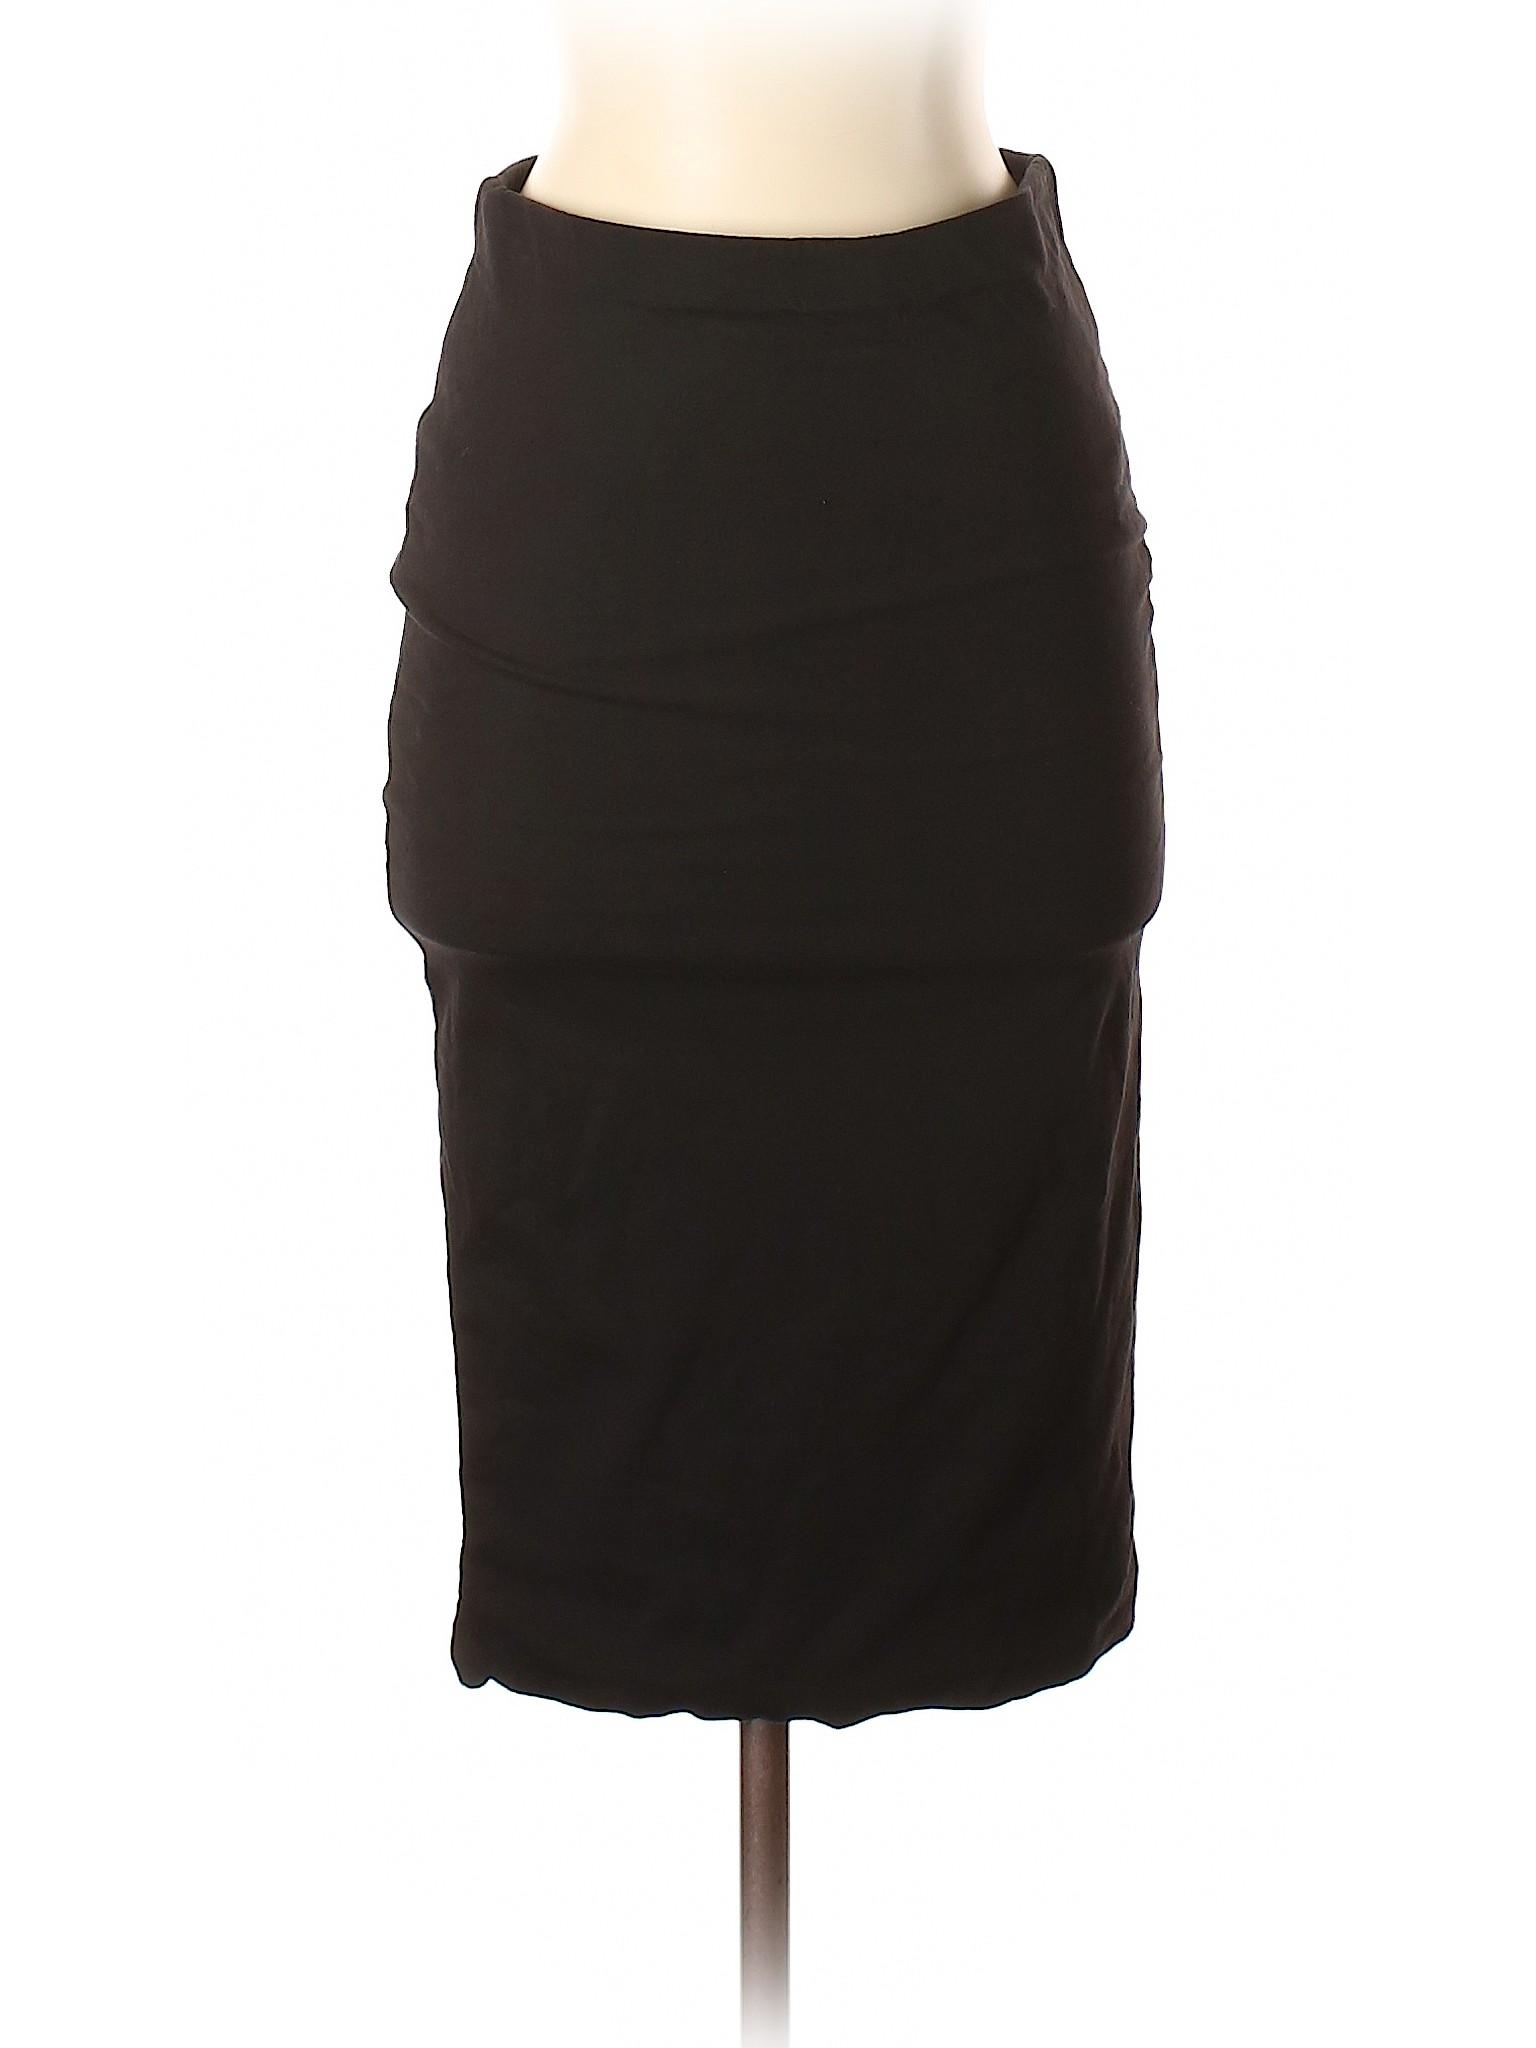 Boutique Casual Skirt Casual Boutique RWZdaq